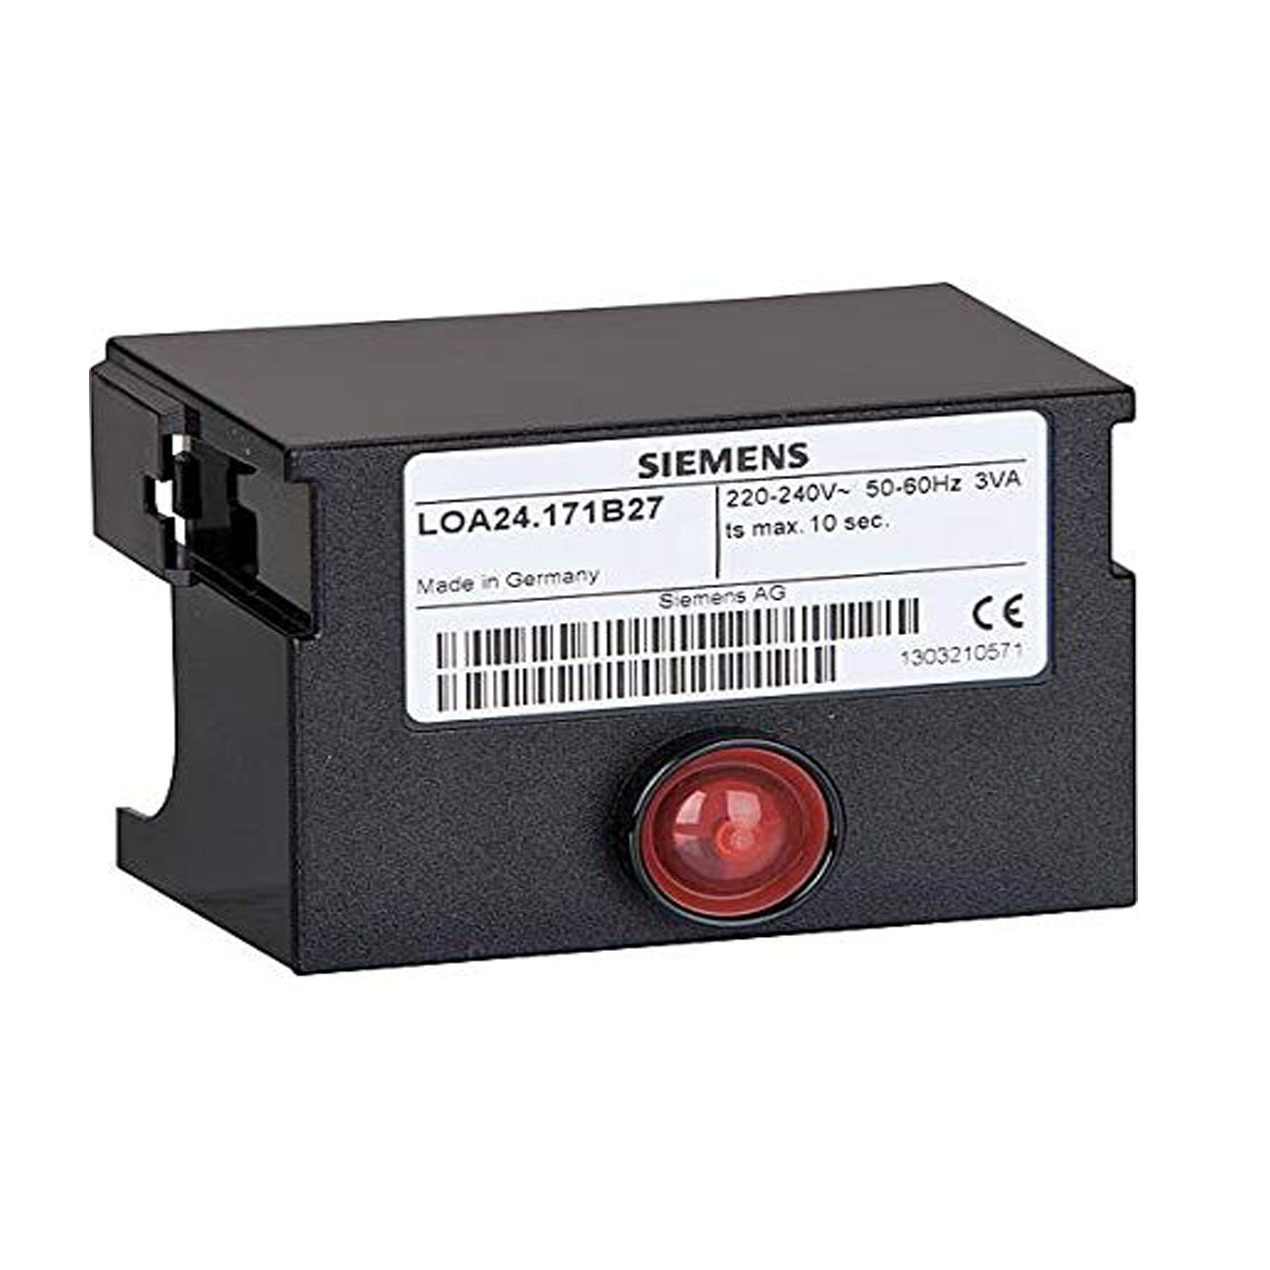 Siemens control box LOA24